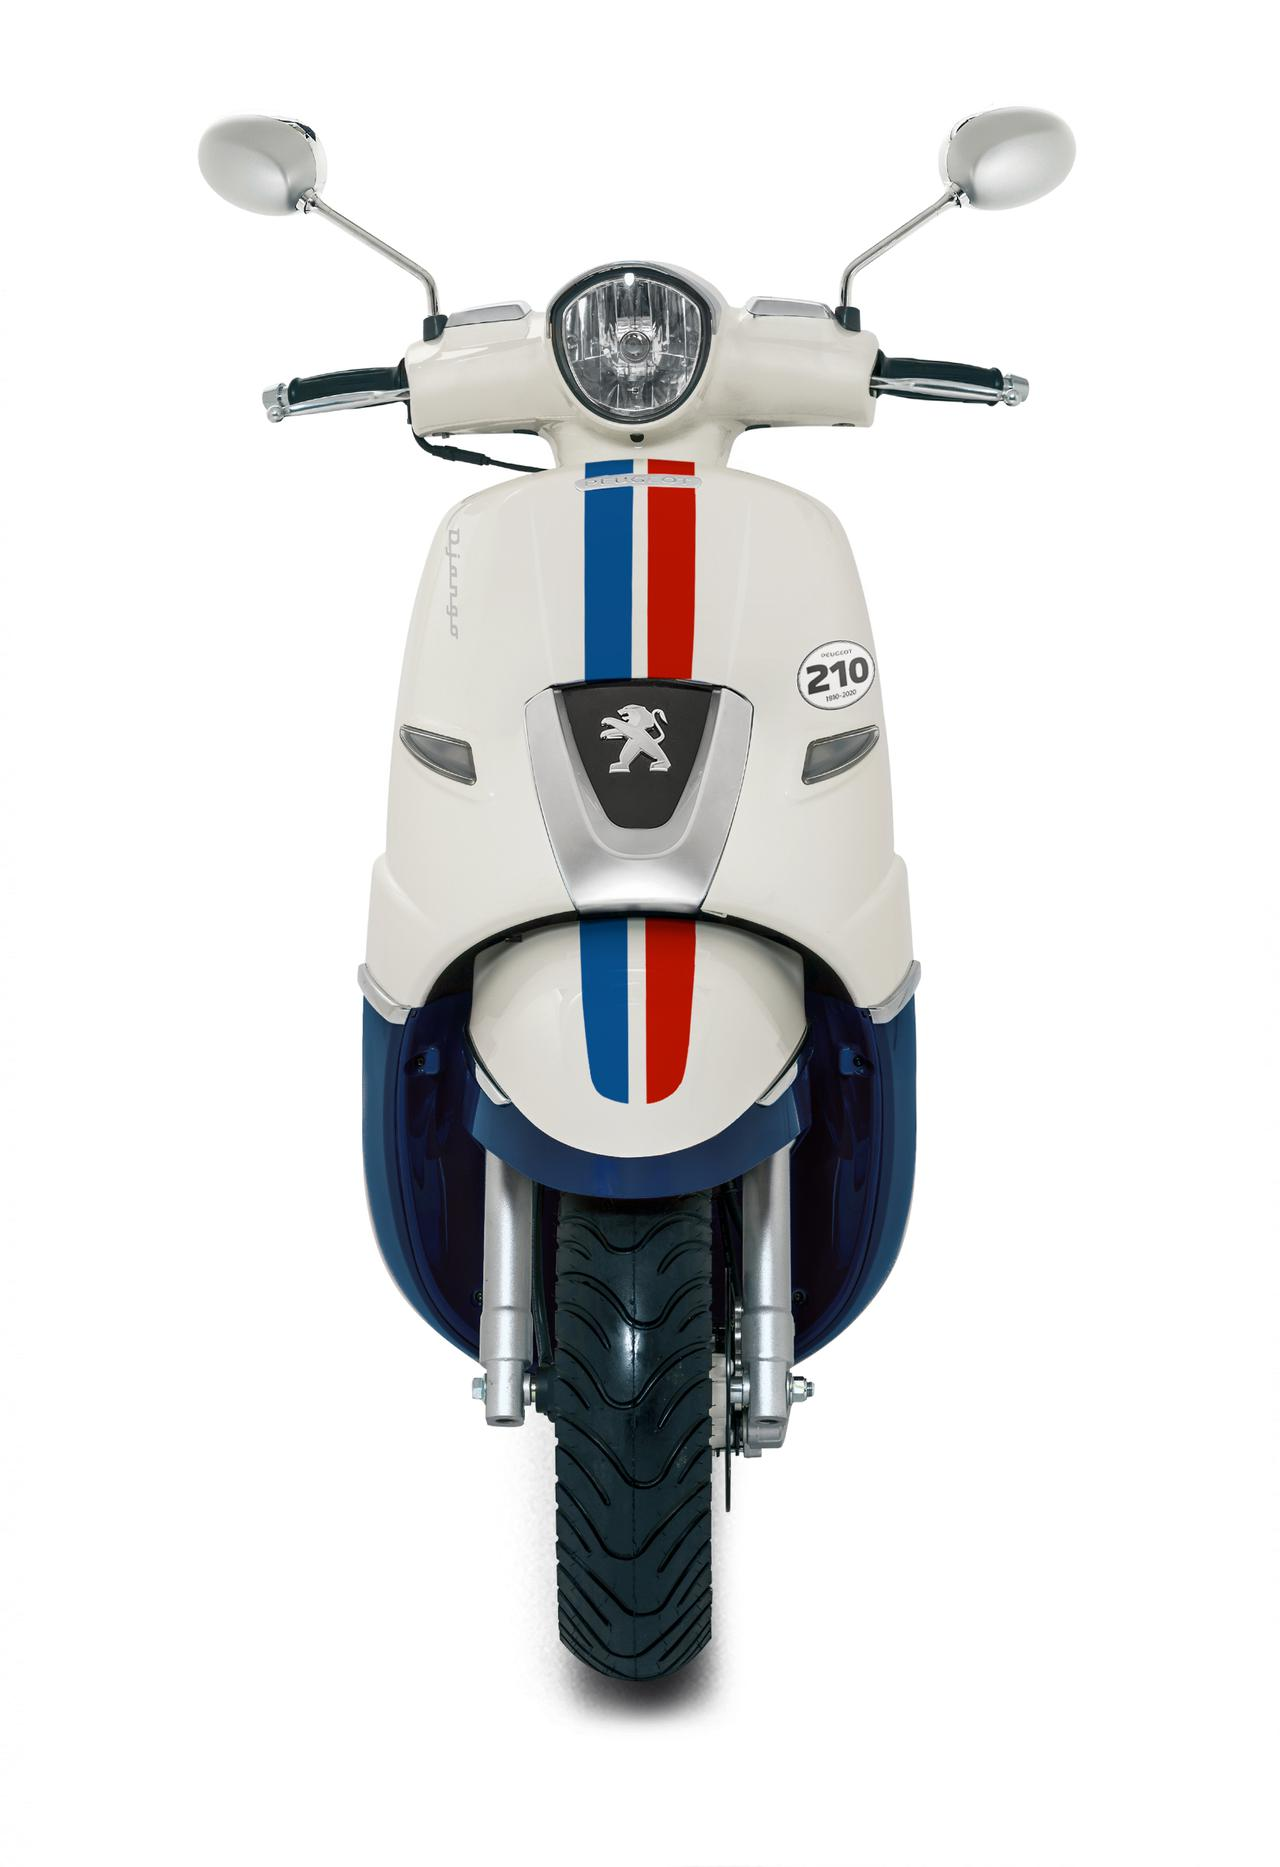 Images : 12番目の画像 - 「ジャンゴ 125 ABS 210周年リミテッドエディション」の写真を見る - LAWRENCE - Motorcycle x Cars + α = Your Life.